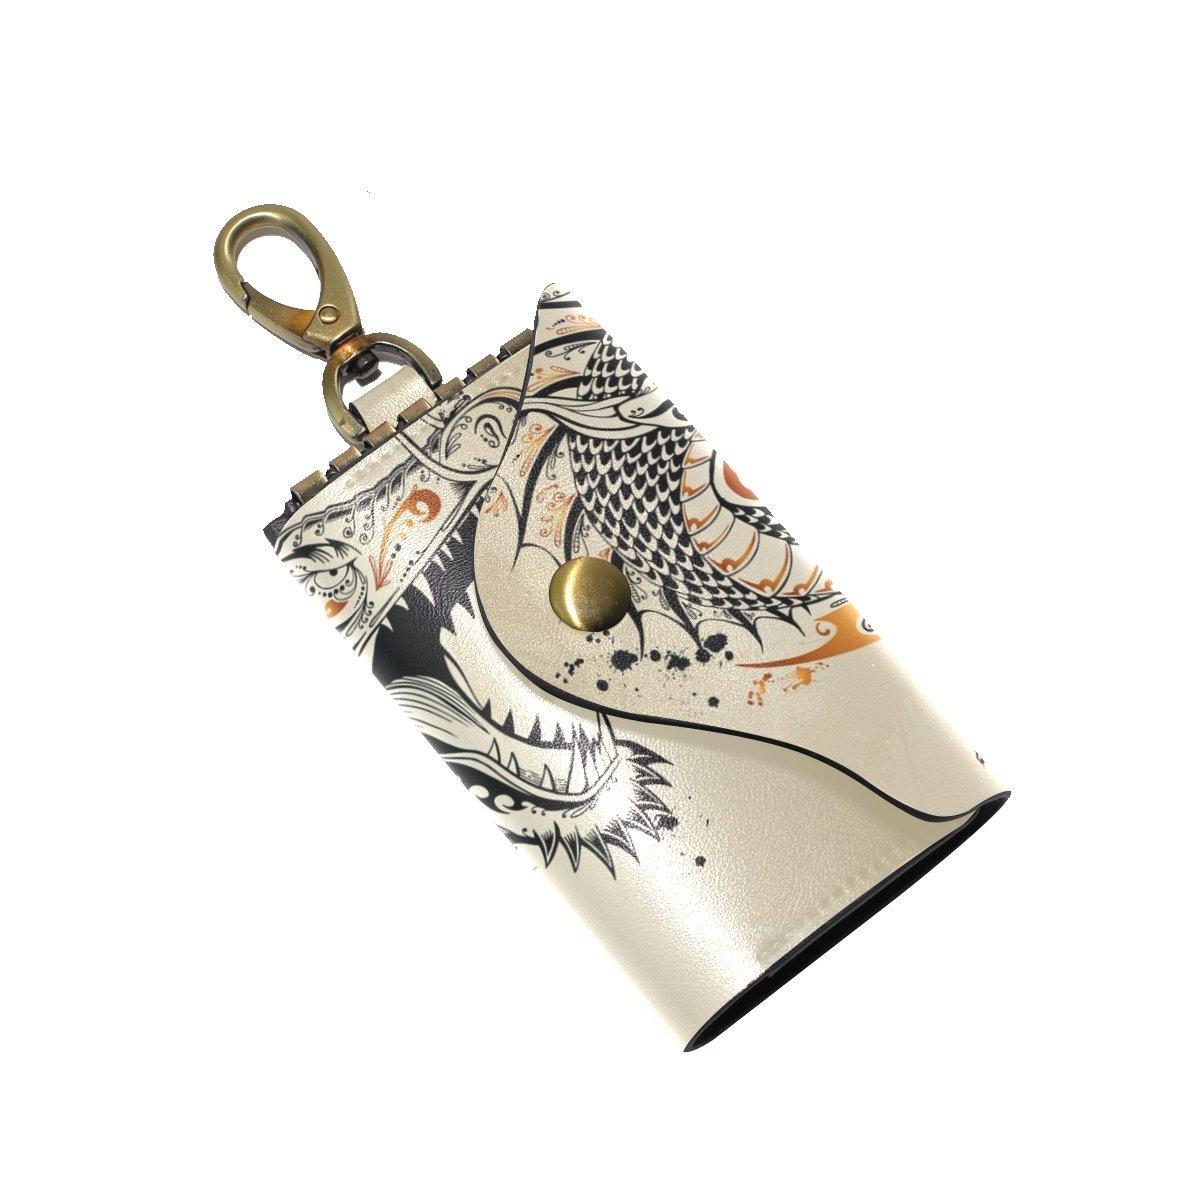 KEAKIA Dragon Doodle Sketch Leather Key Case Wallets Tri-fold Key Holder Keychains with 6 Hooks 2 Slot Snap Closure for Men Women